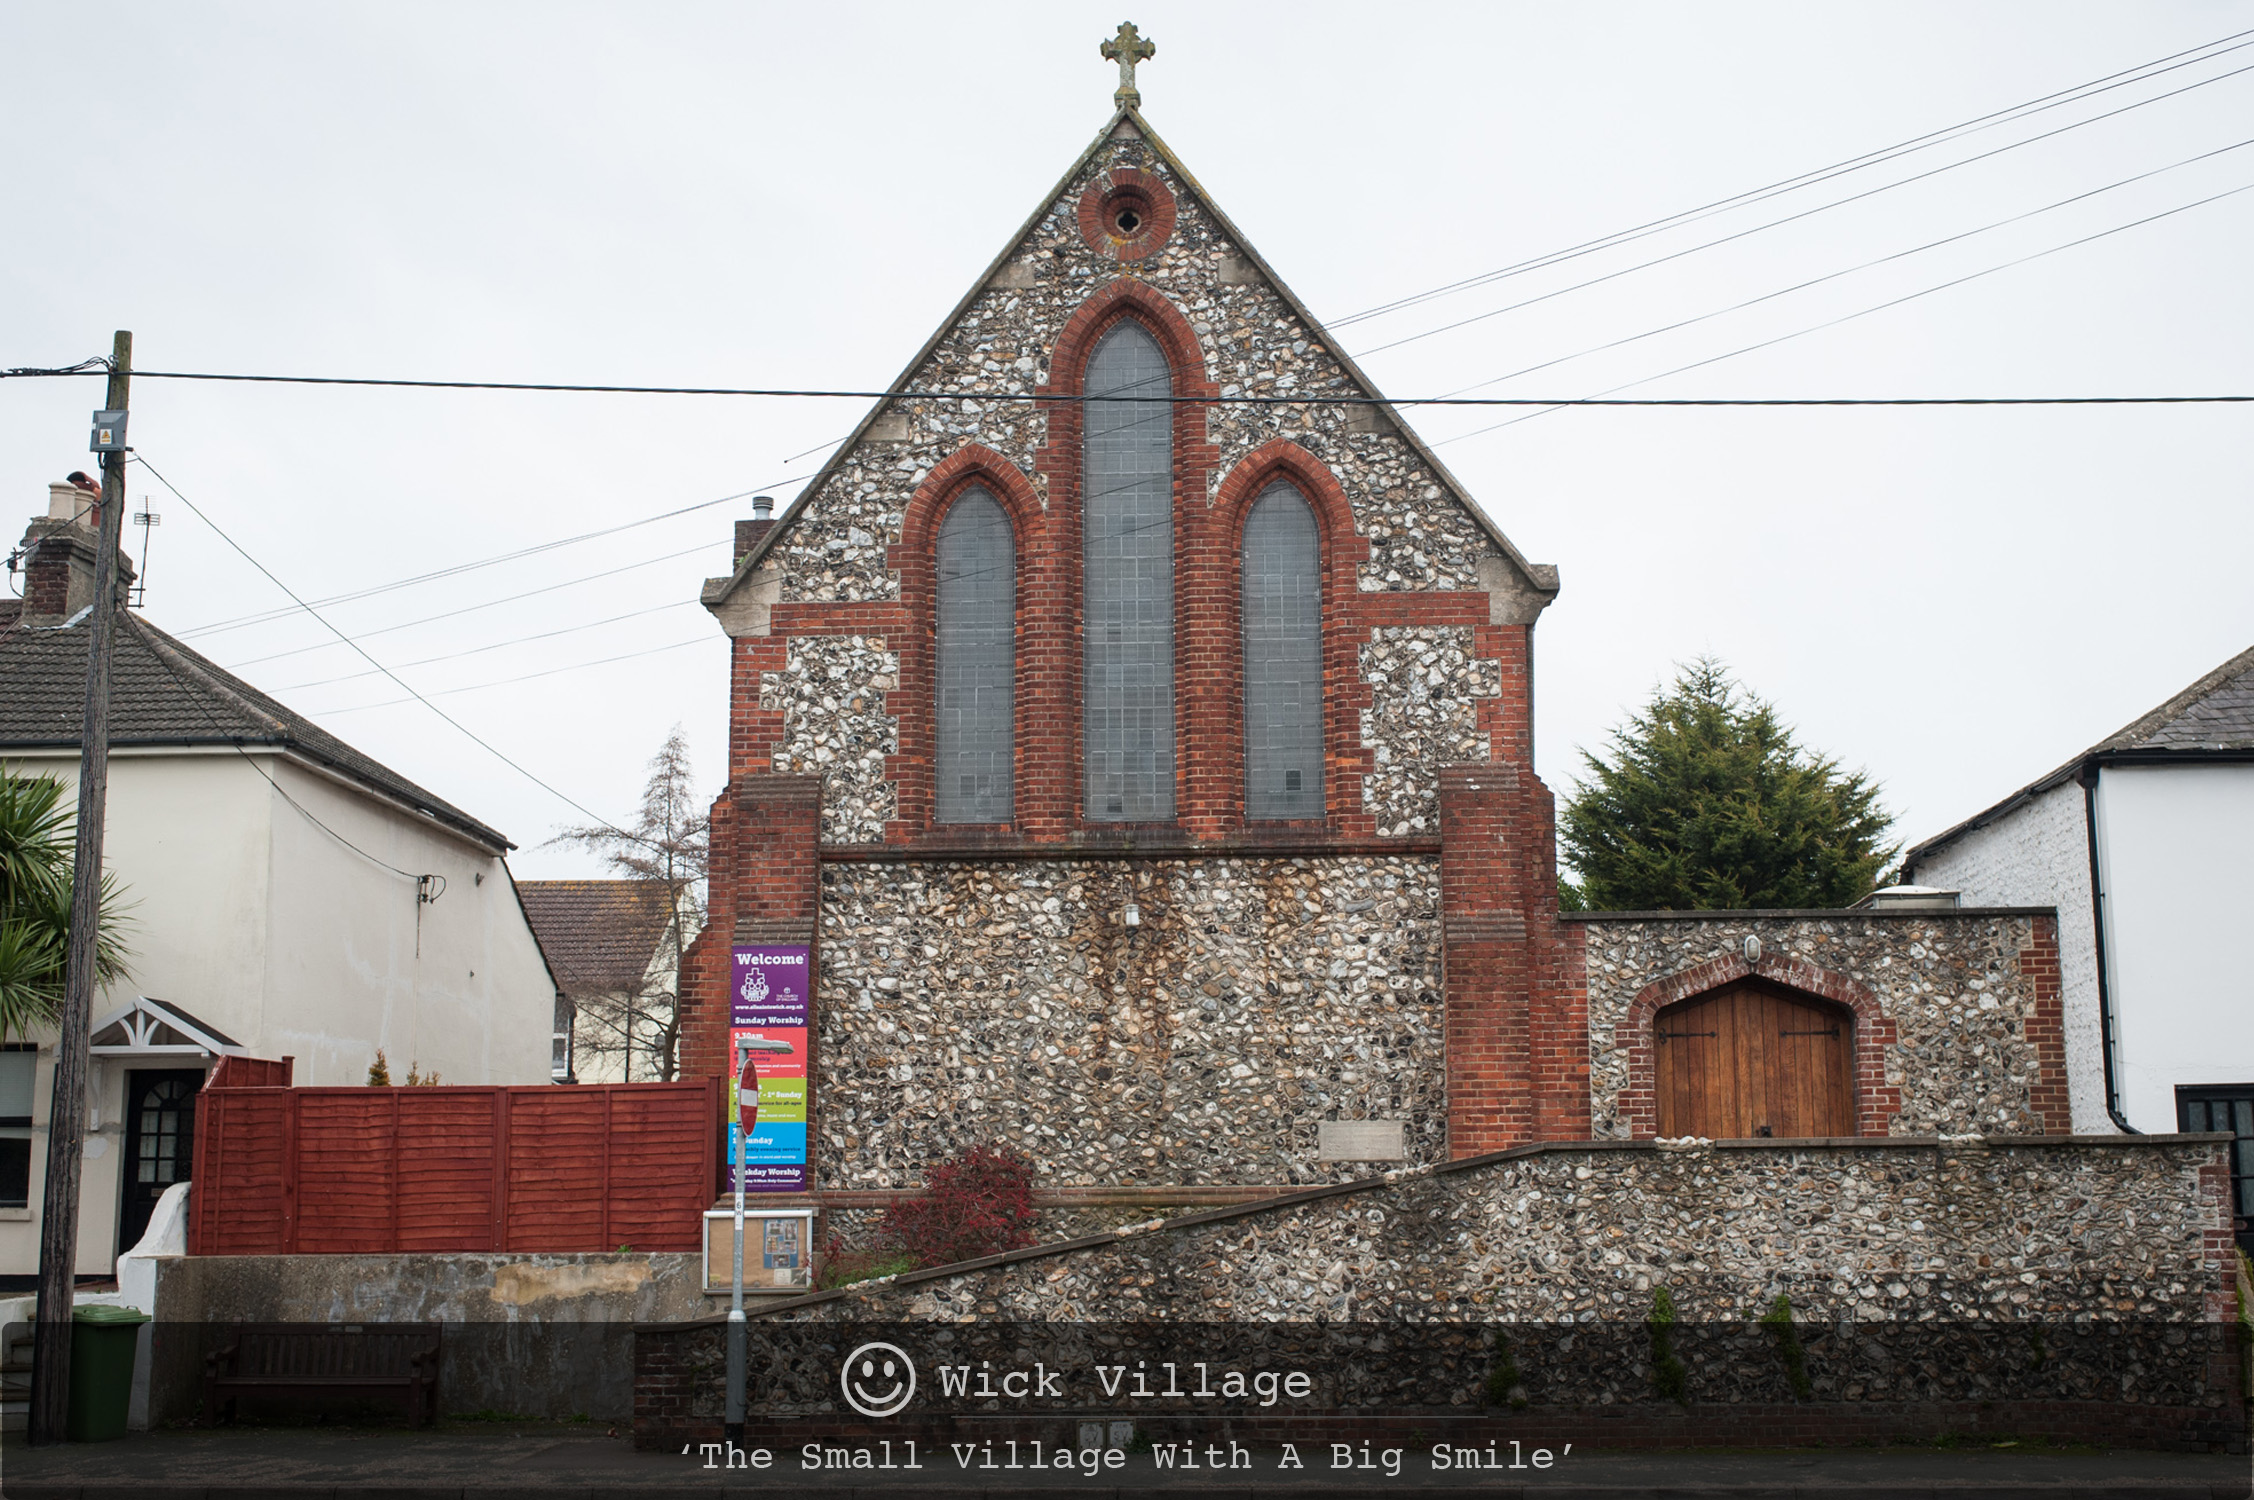 All Saints Church, Wick Village, Littlehampton.